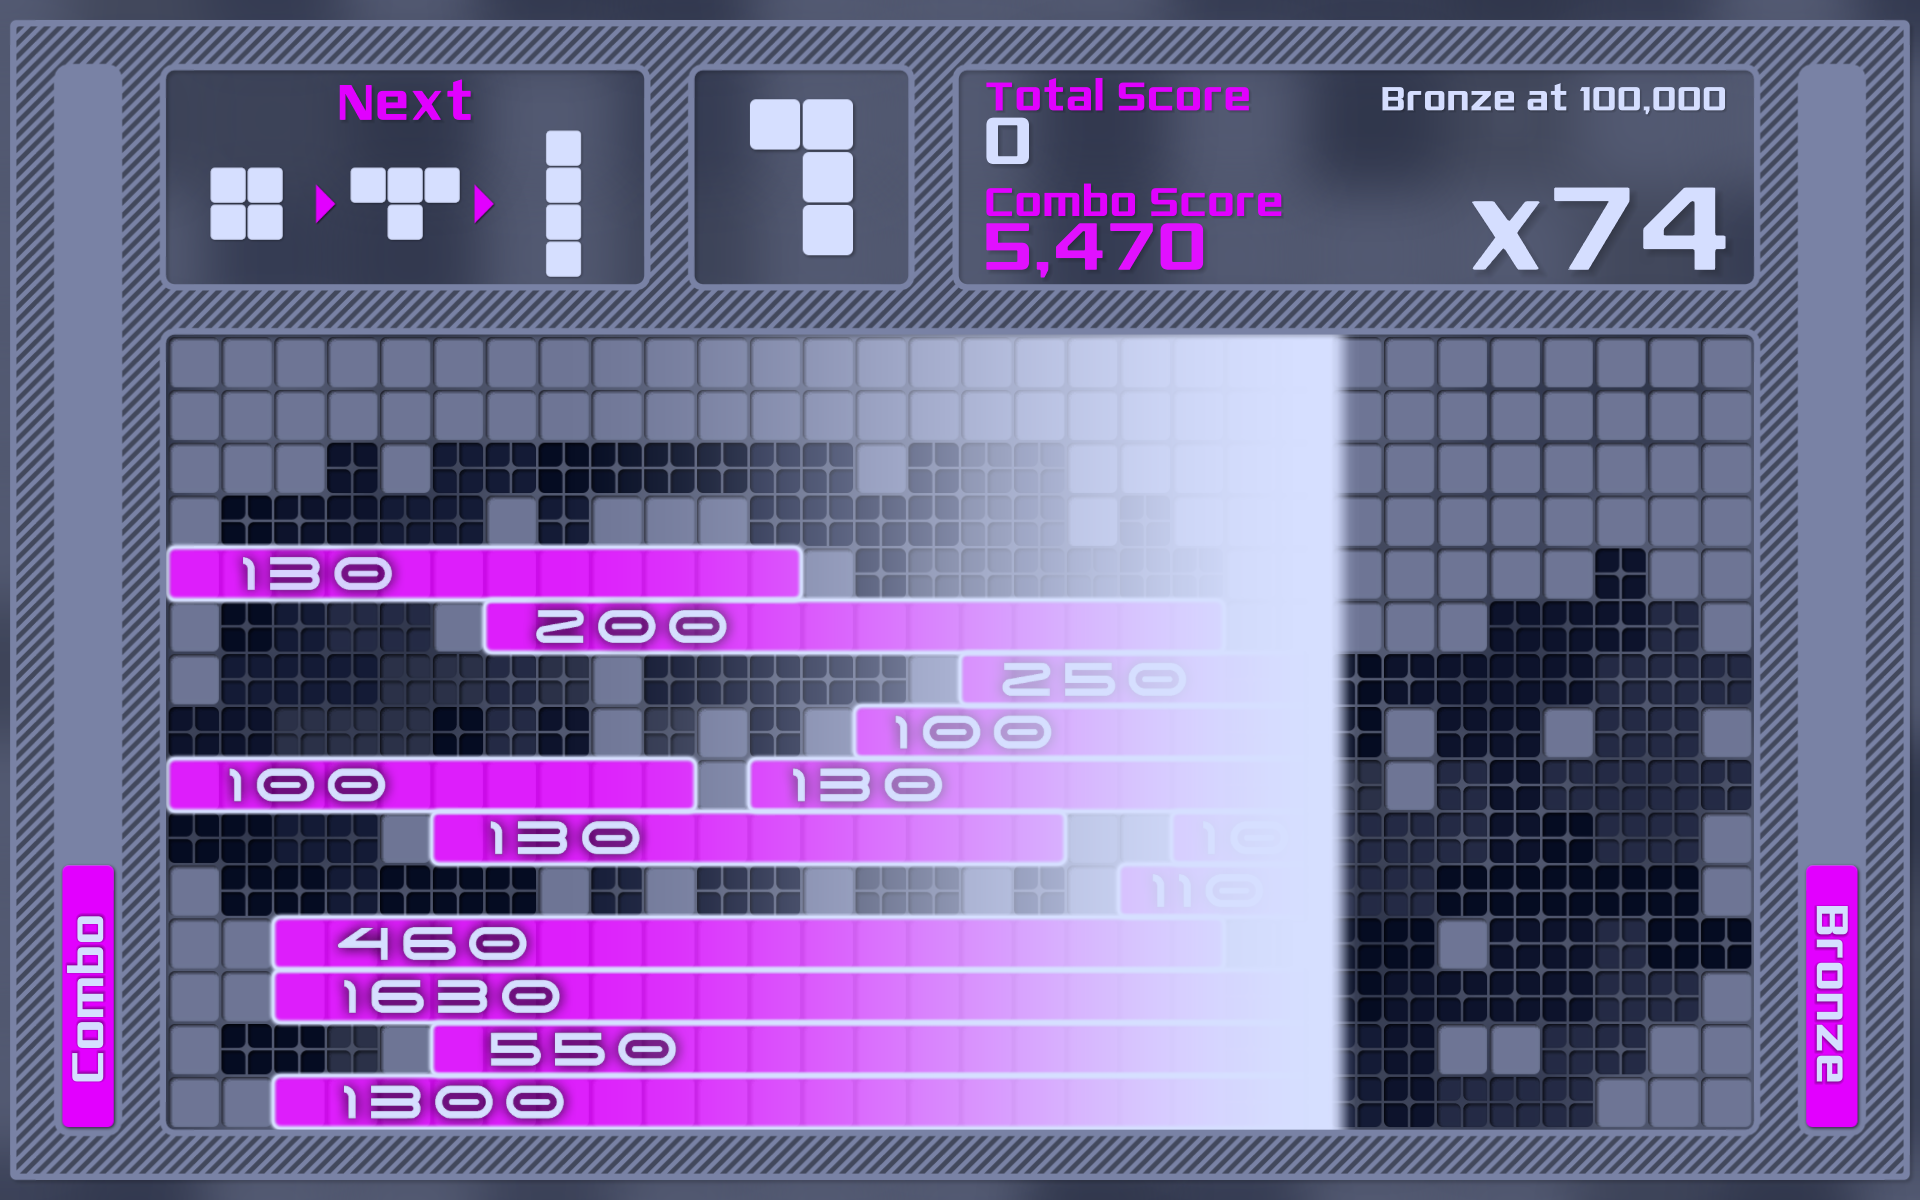 screen 5